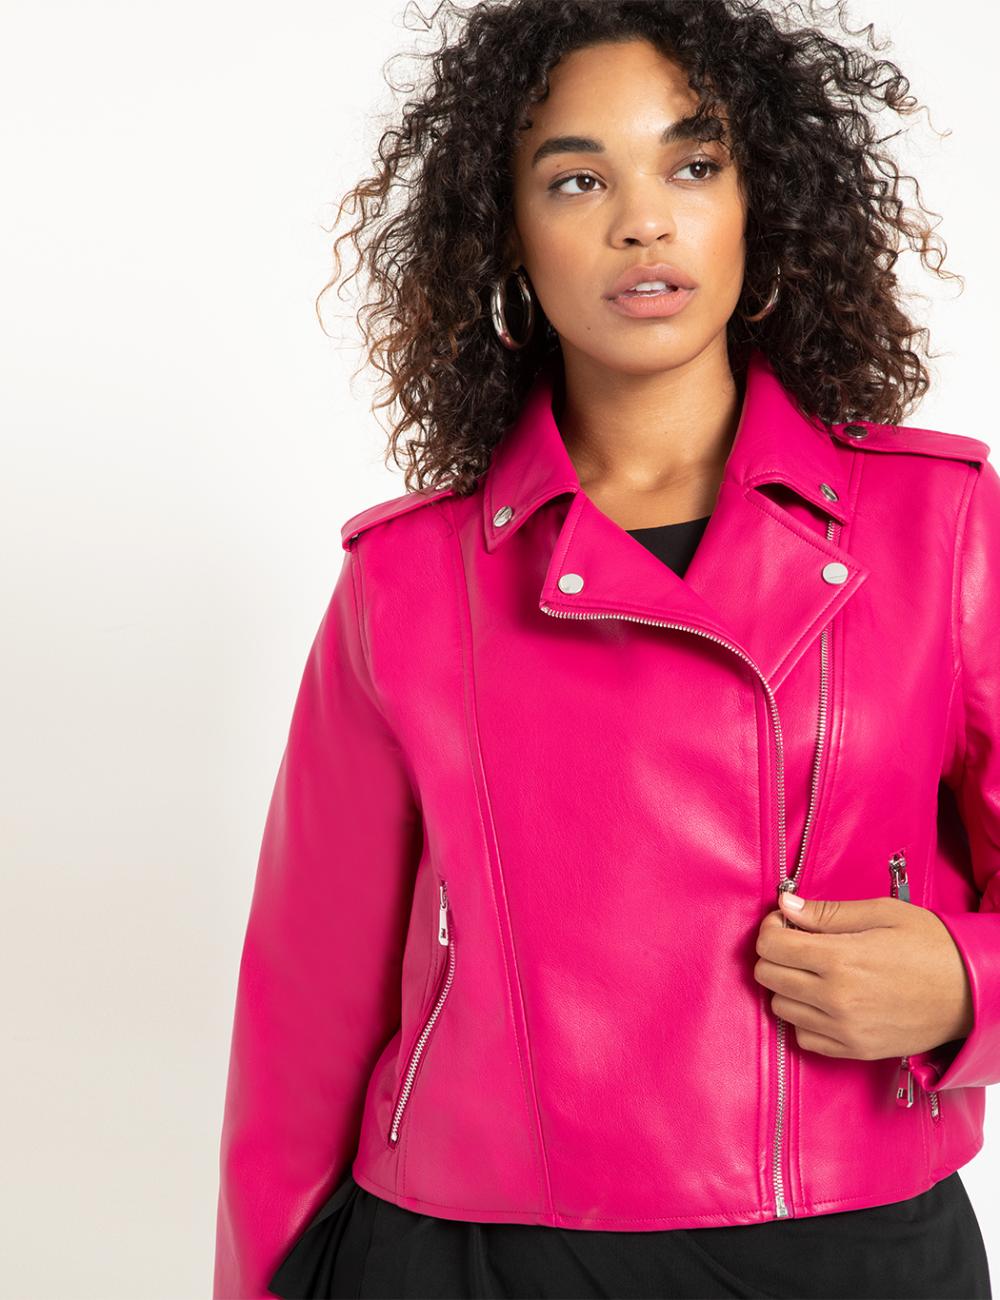 Faux Leather Moto Jacket Women S Plus Size Coats Jackets Eloquii In 2021 Faux Leather Moto Jacket Best Leather Jackets Celebrities Leather Jacket [ 1300 x 1000 Pixel ]